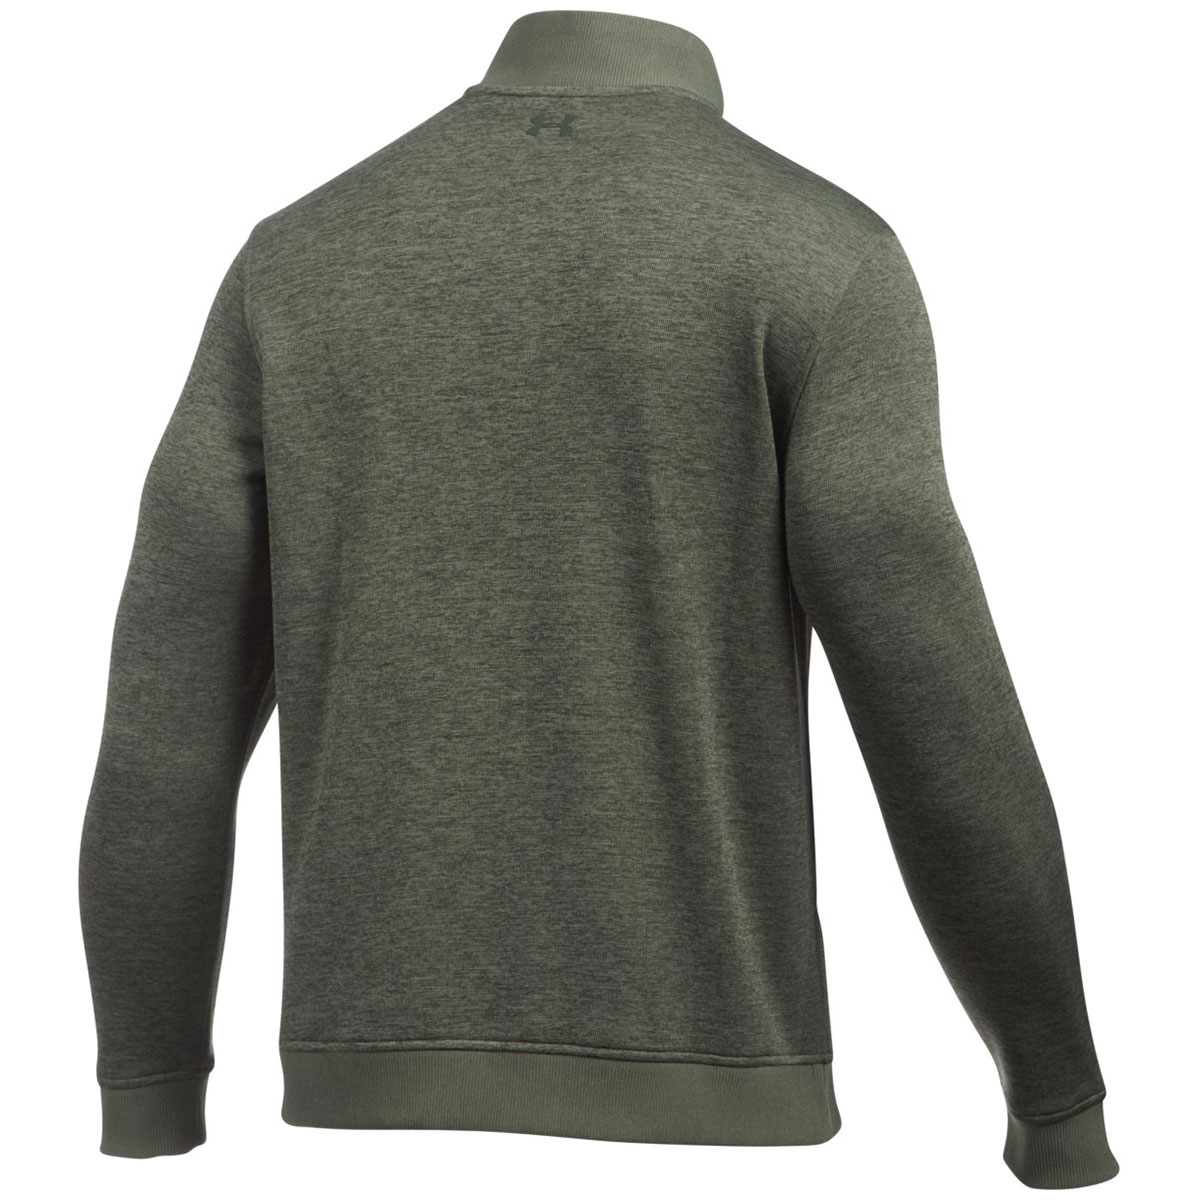 Under-Armour-Mens-UA-Storm-Sweater-Fleece-1-4-Zip-Pullover-Jumper-25-OFF-RRP thumbnail 16